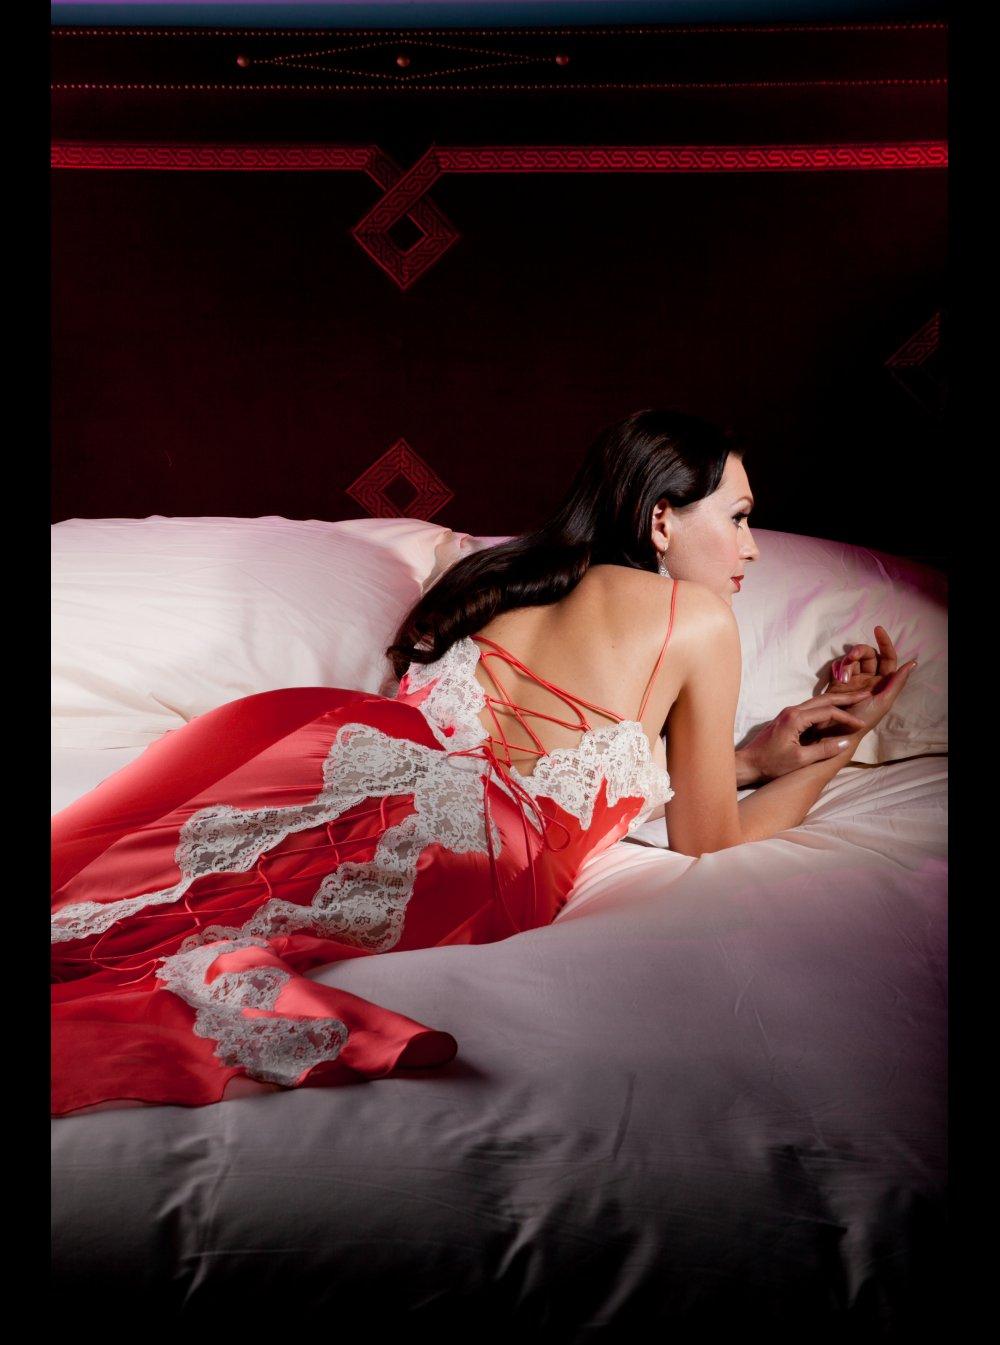 df97ab4eea Jane Woolrich, Silk Nightdress, 7979 - Honeys Lingerie Boutique